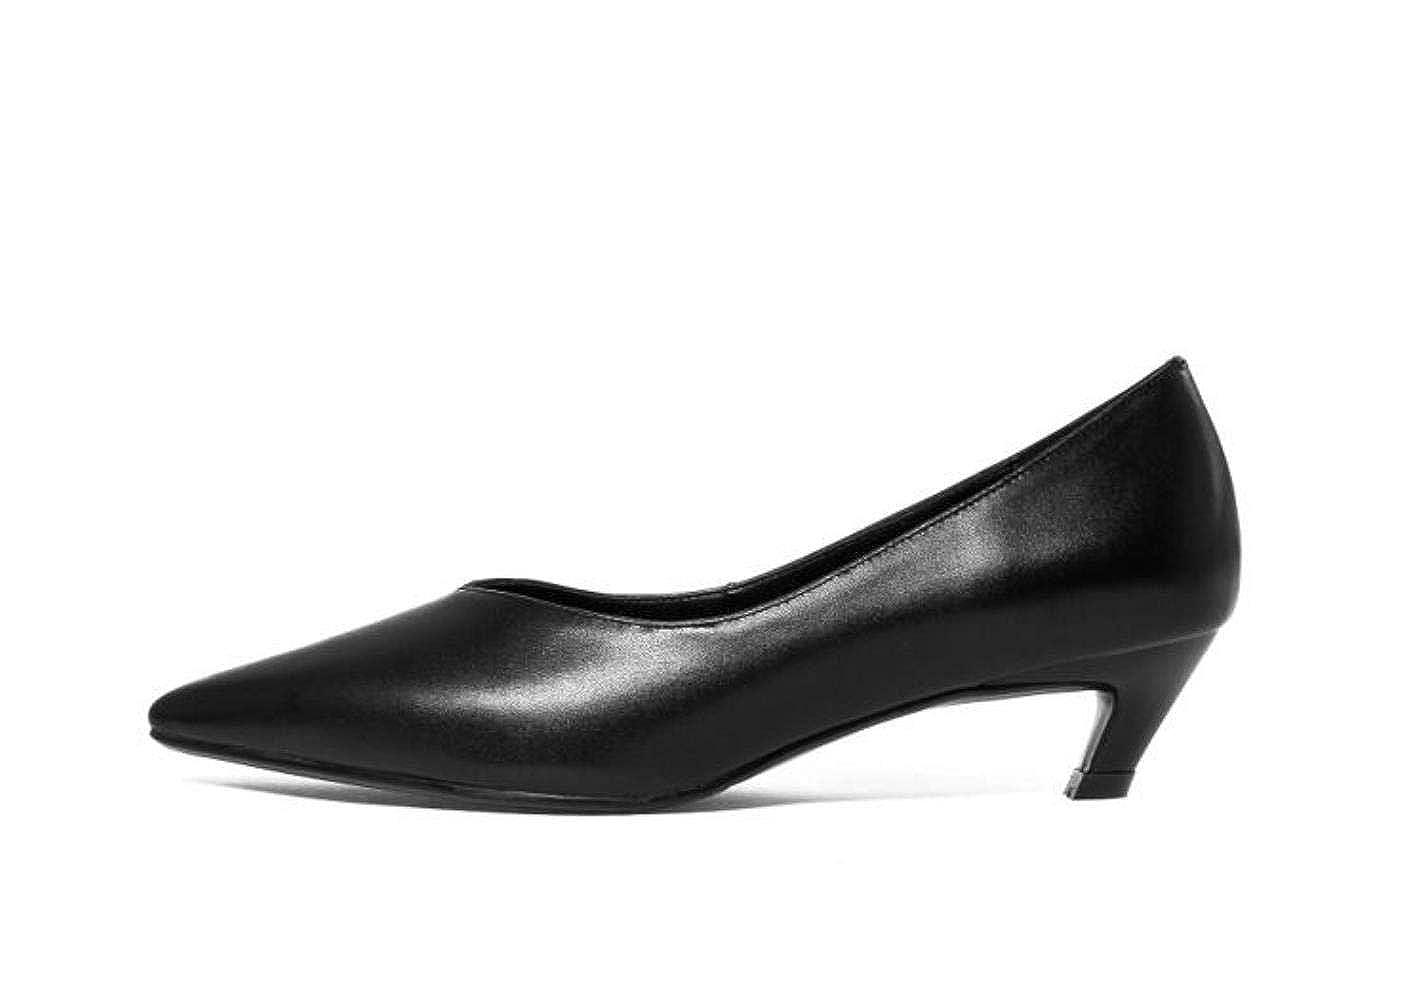 Black Woman Genuine Leather Slip On Lower Heels 4cm shoes Office Pumps